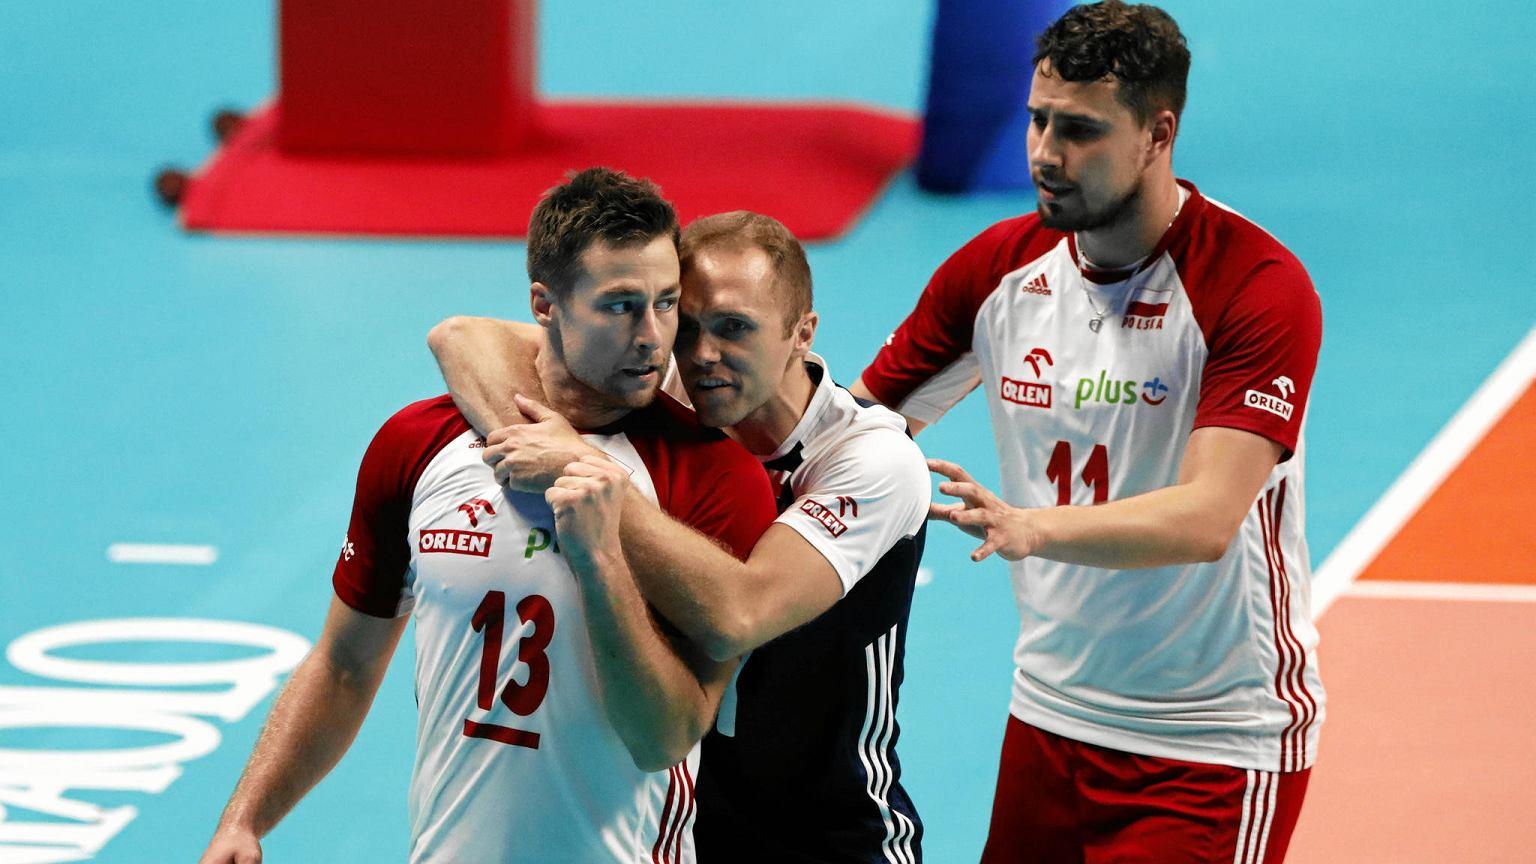 Poland - Slovenia 3-0.